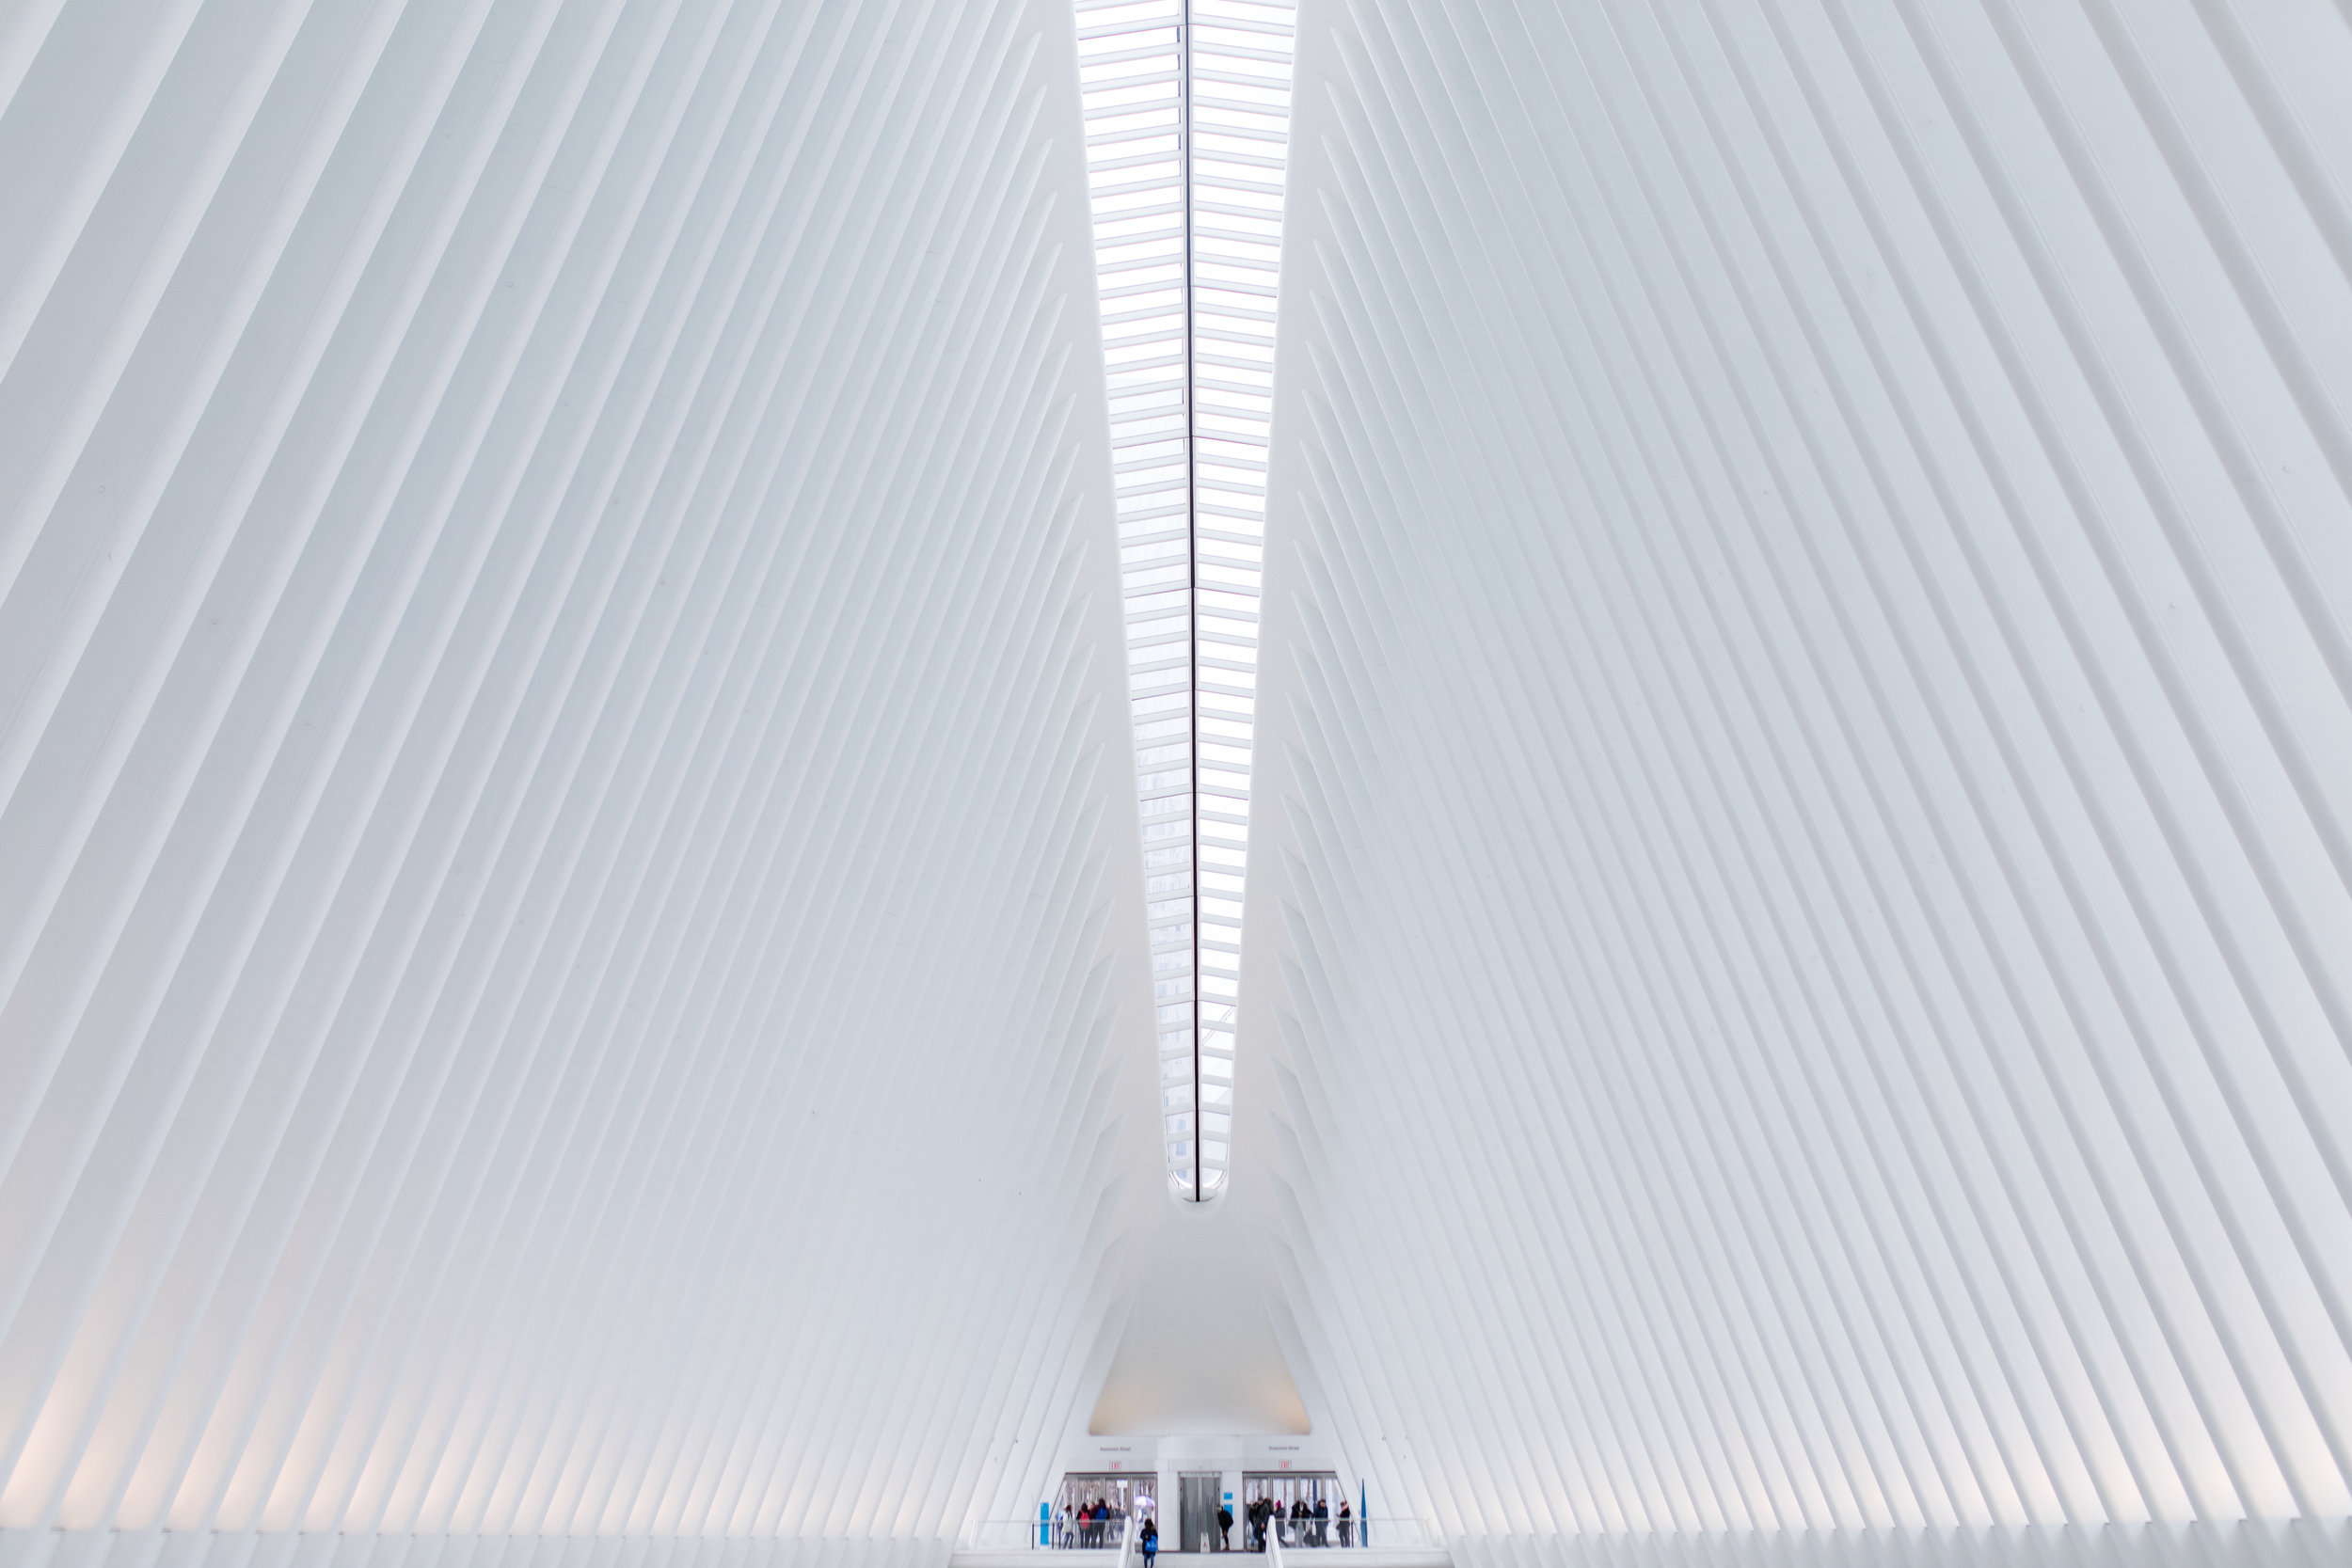 NYC_0119.jpg